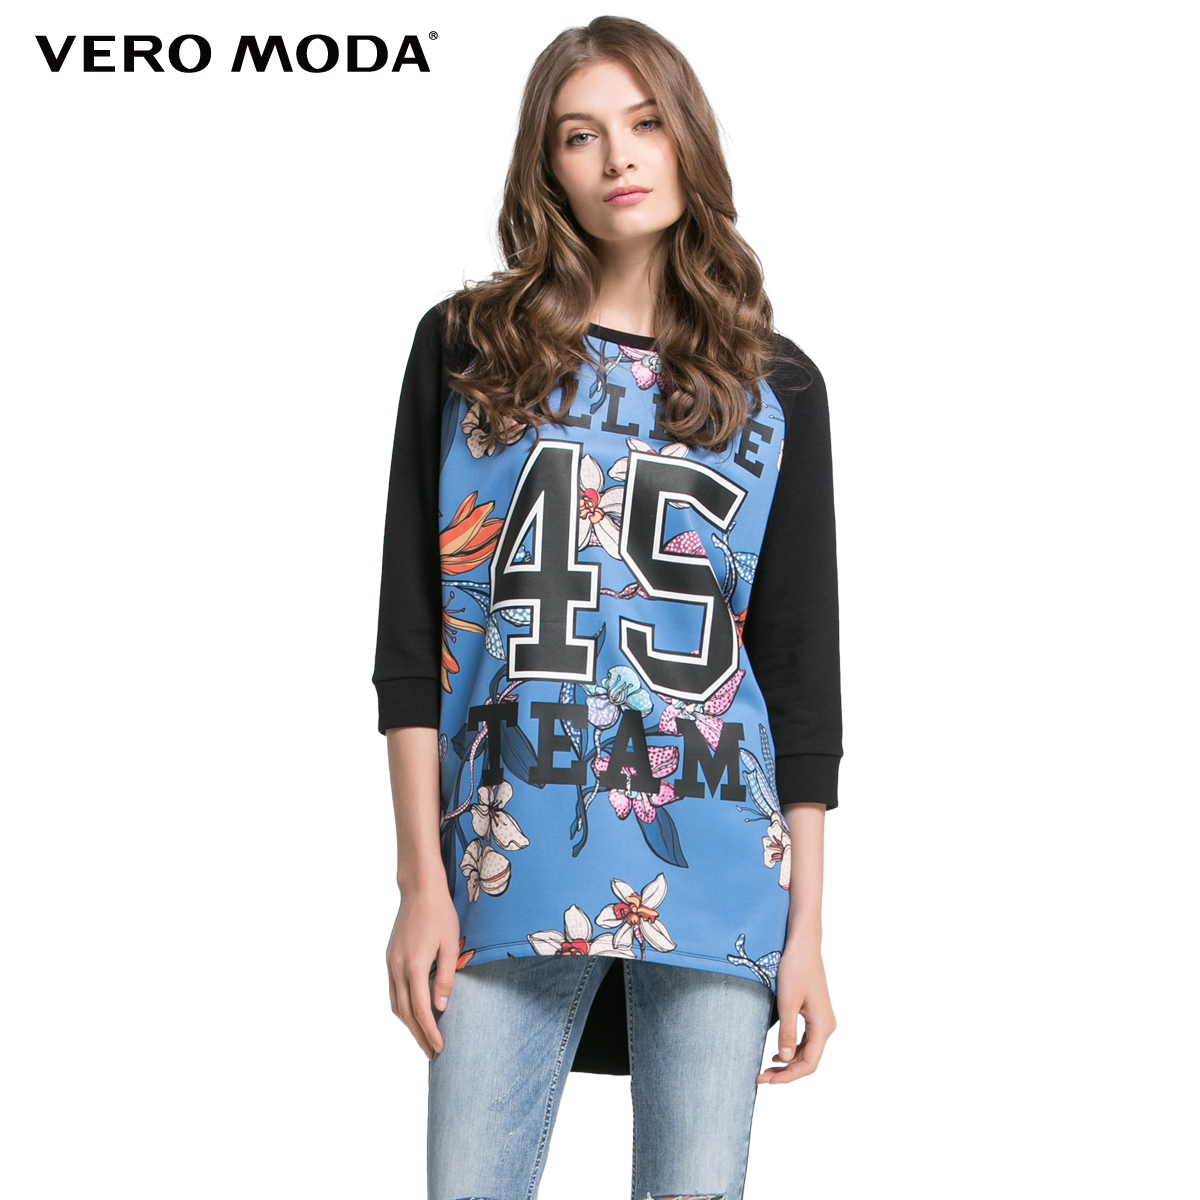 Vero ModaT恤怎么样,Vero Moda女装质量好吗